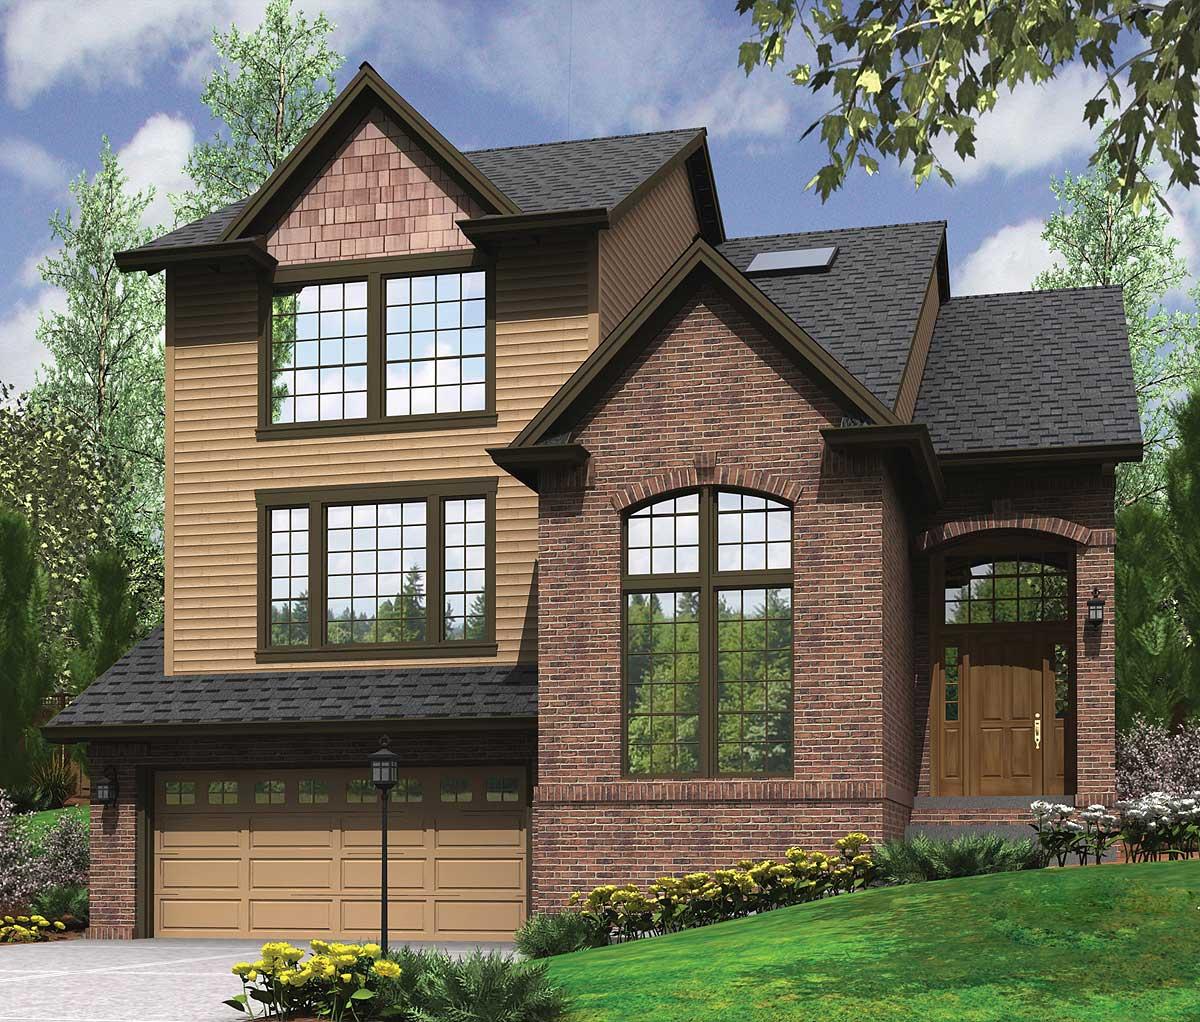 Split-Level House Plans with Garage Under